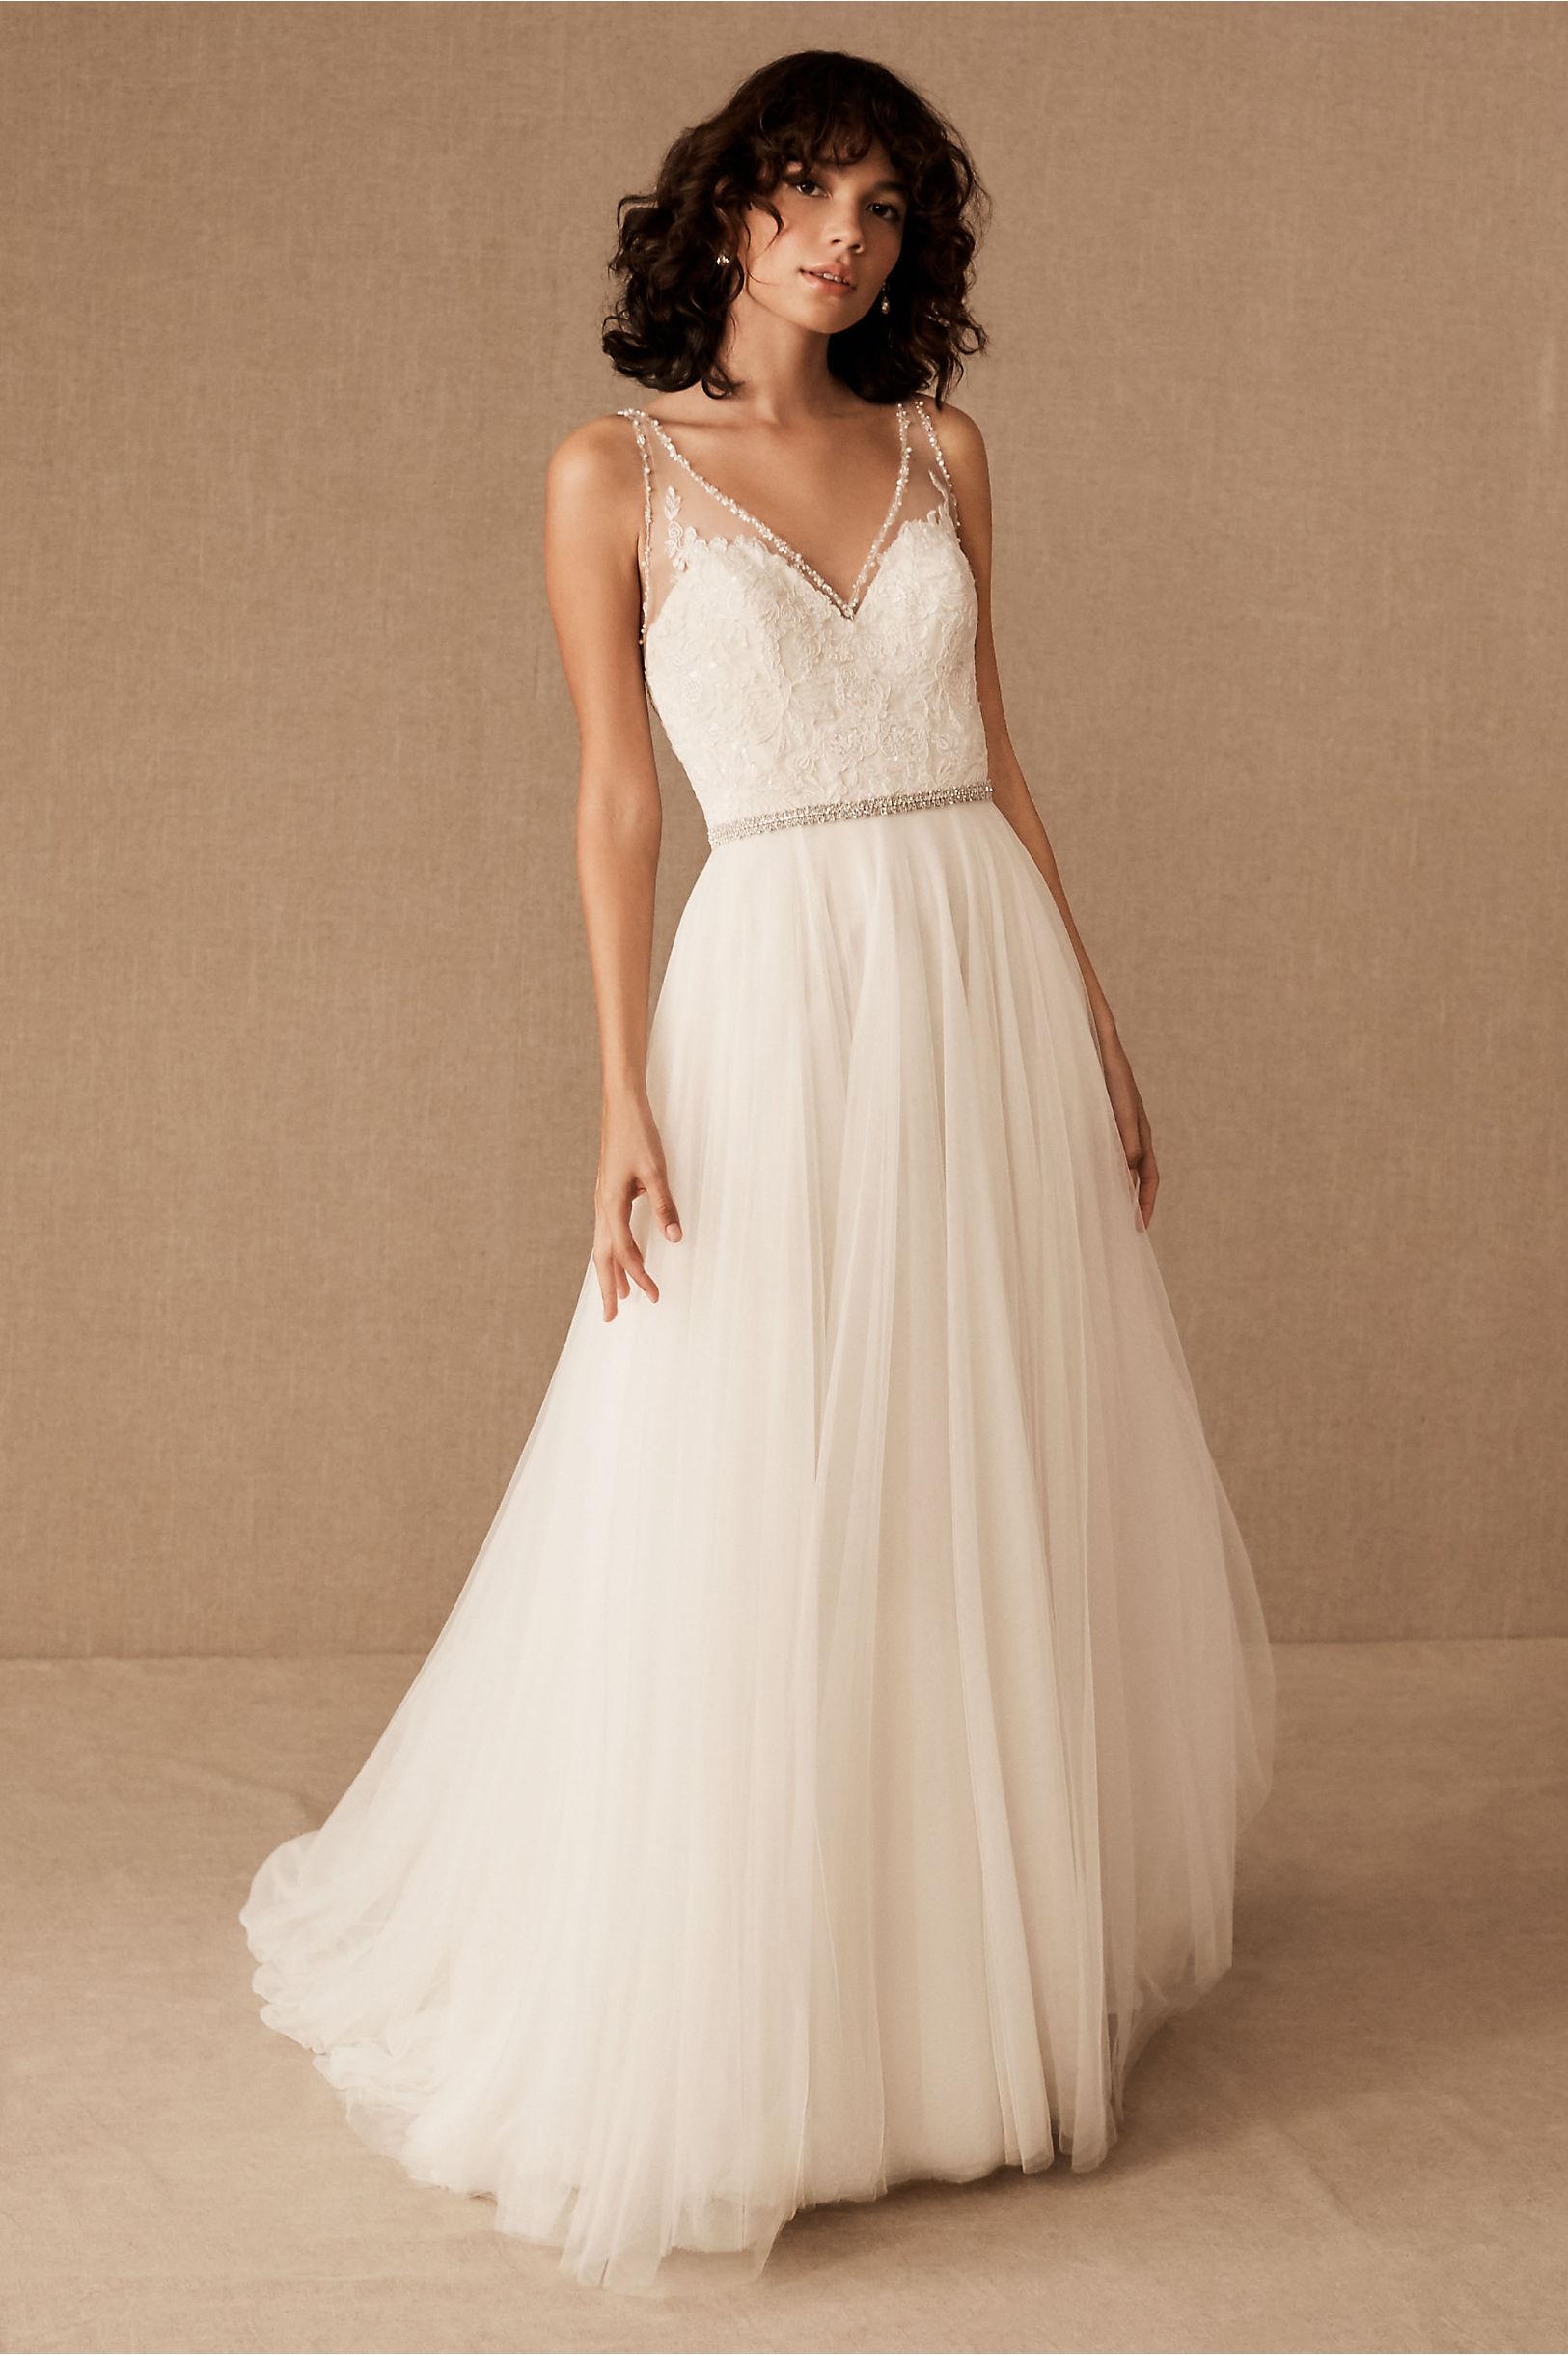 Beach Wedding Dresses Chicago : Wedding dresses chicago share on facebook long sheath beach